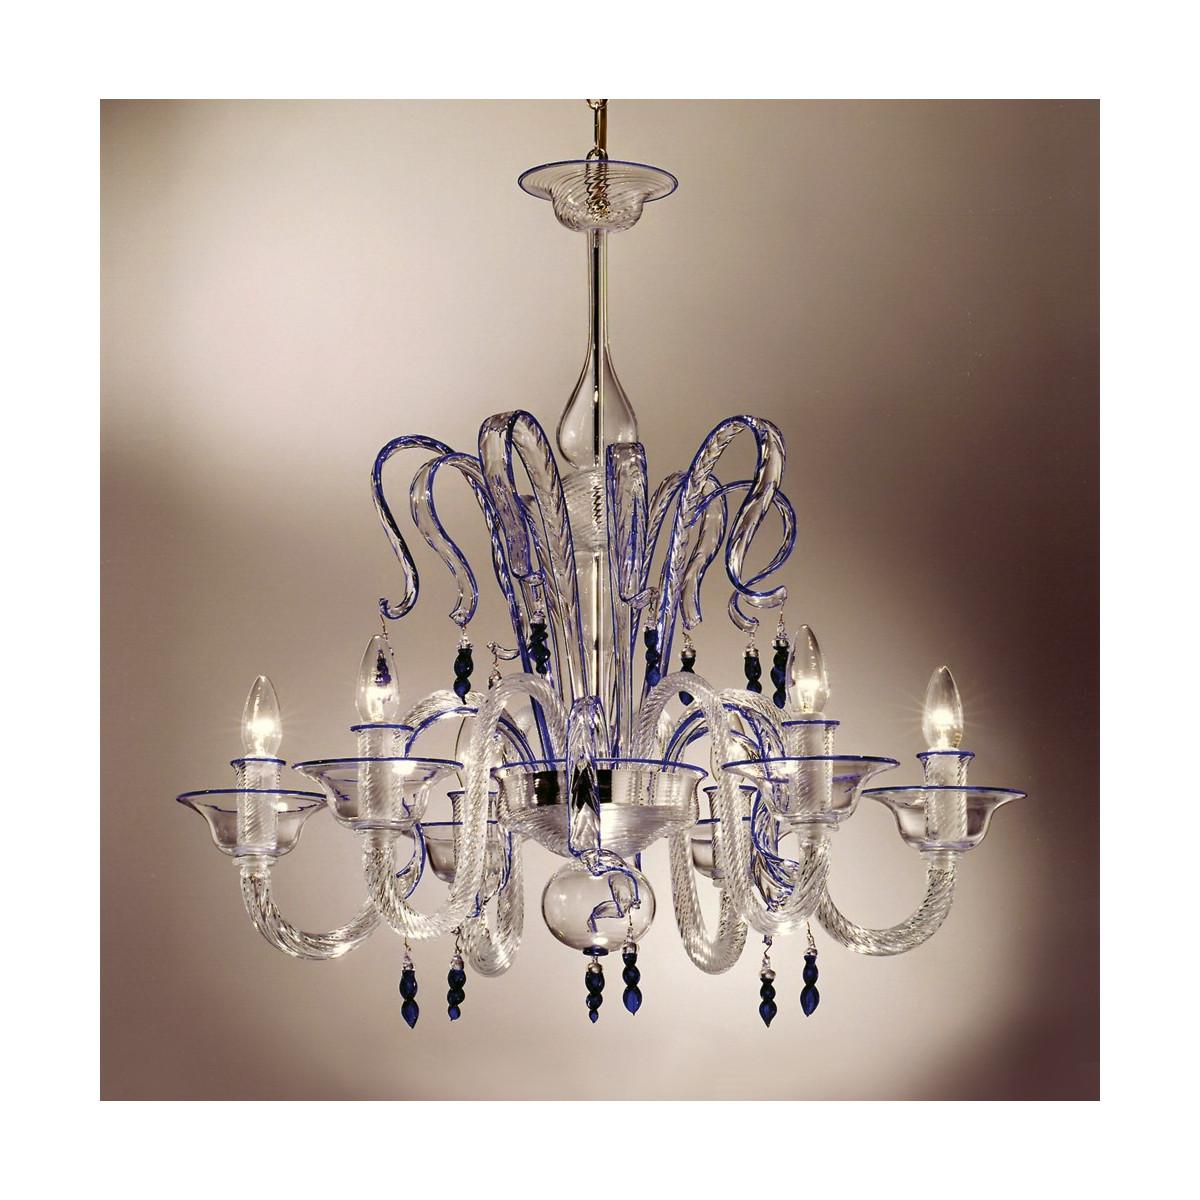 """Zaffiro"" lustre en verre de Murano cristal et bleu 6 lumières"